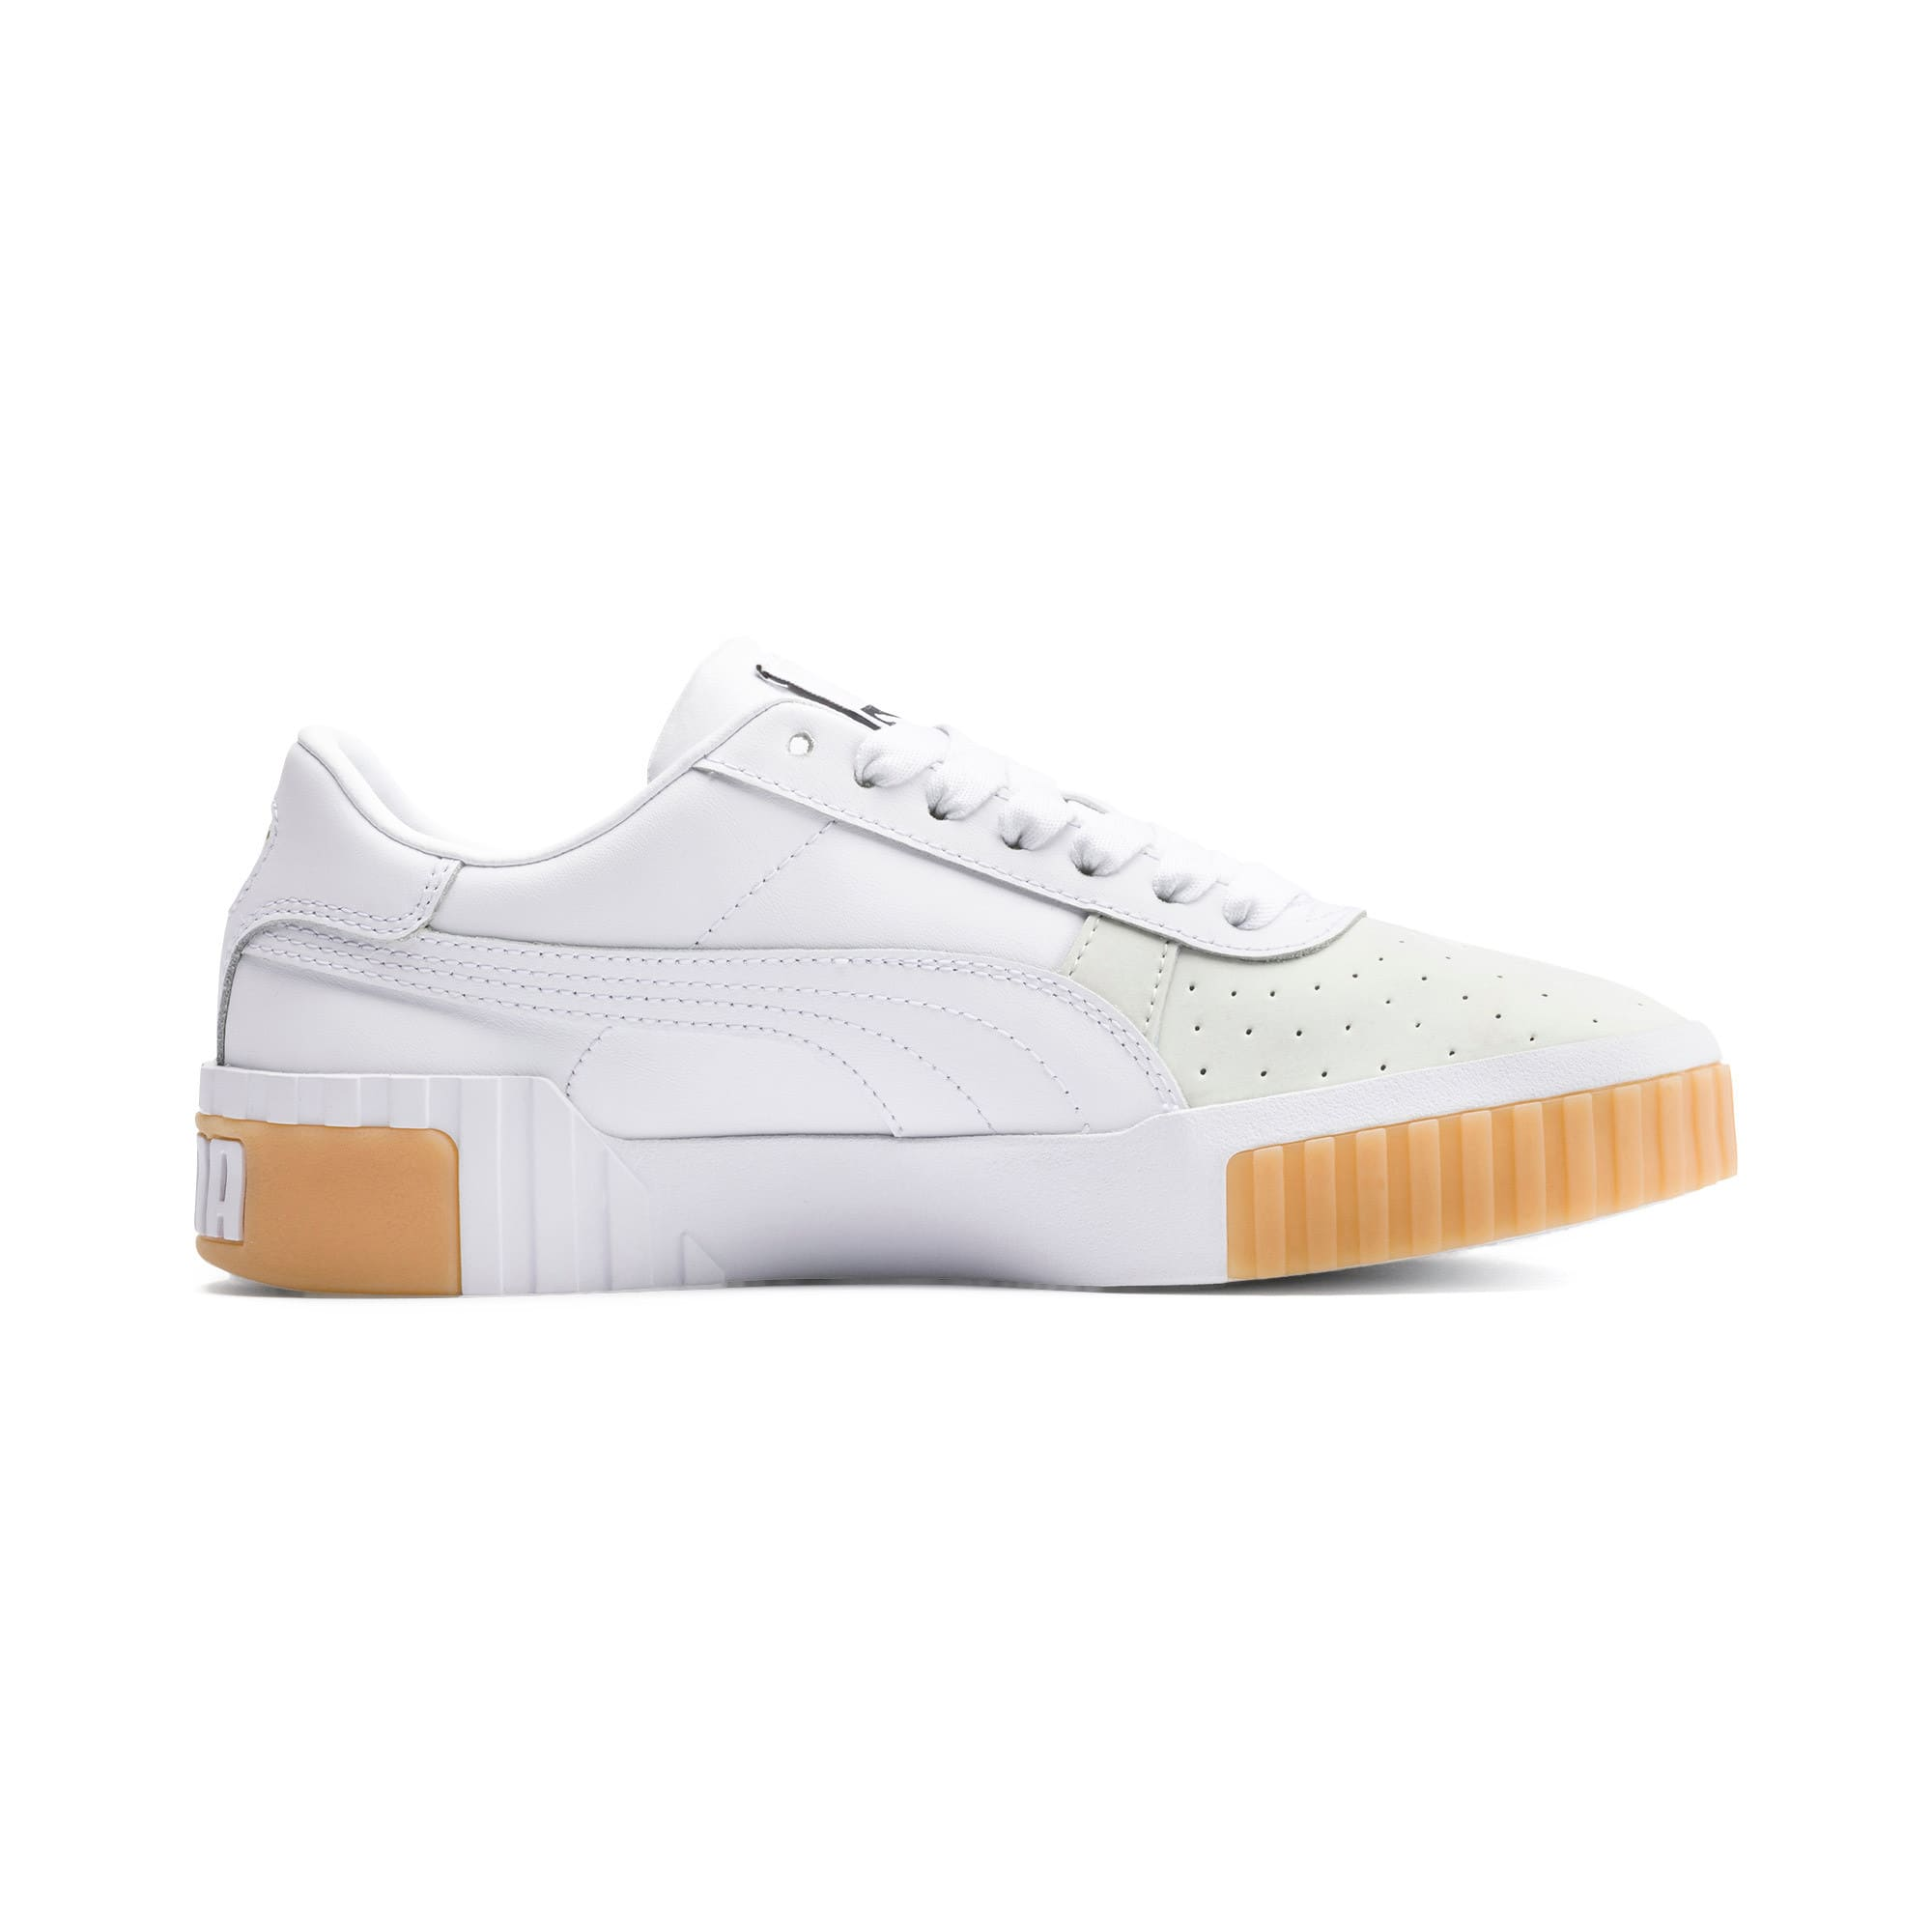 Thumbnail 5 of Cali Exotic Damen Sneaker, Puma White-Puma White, medium